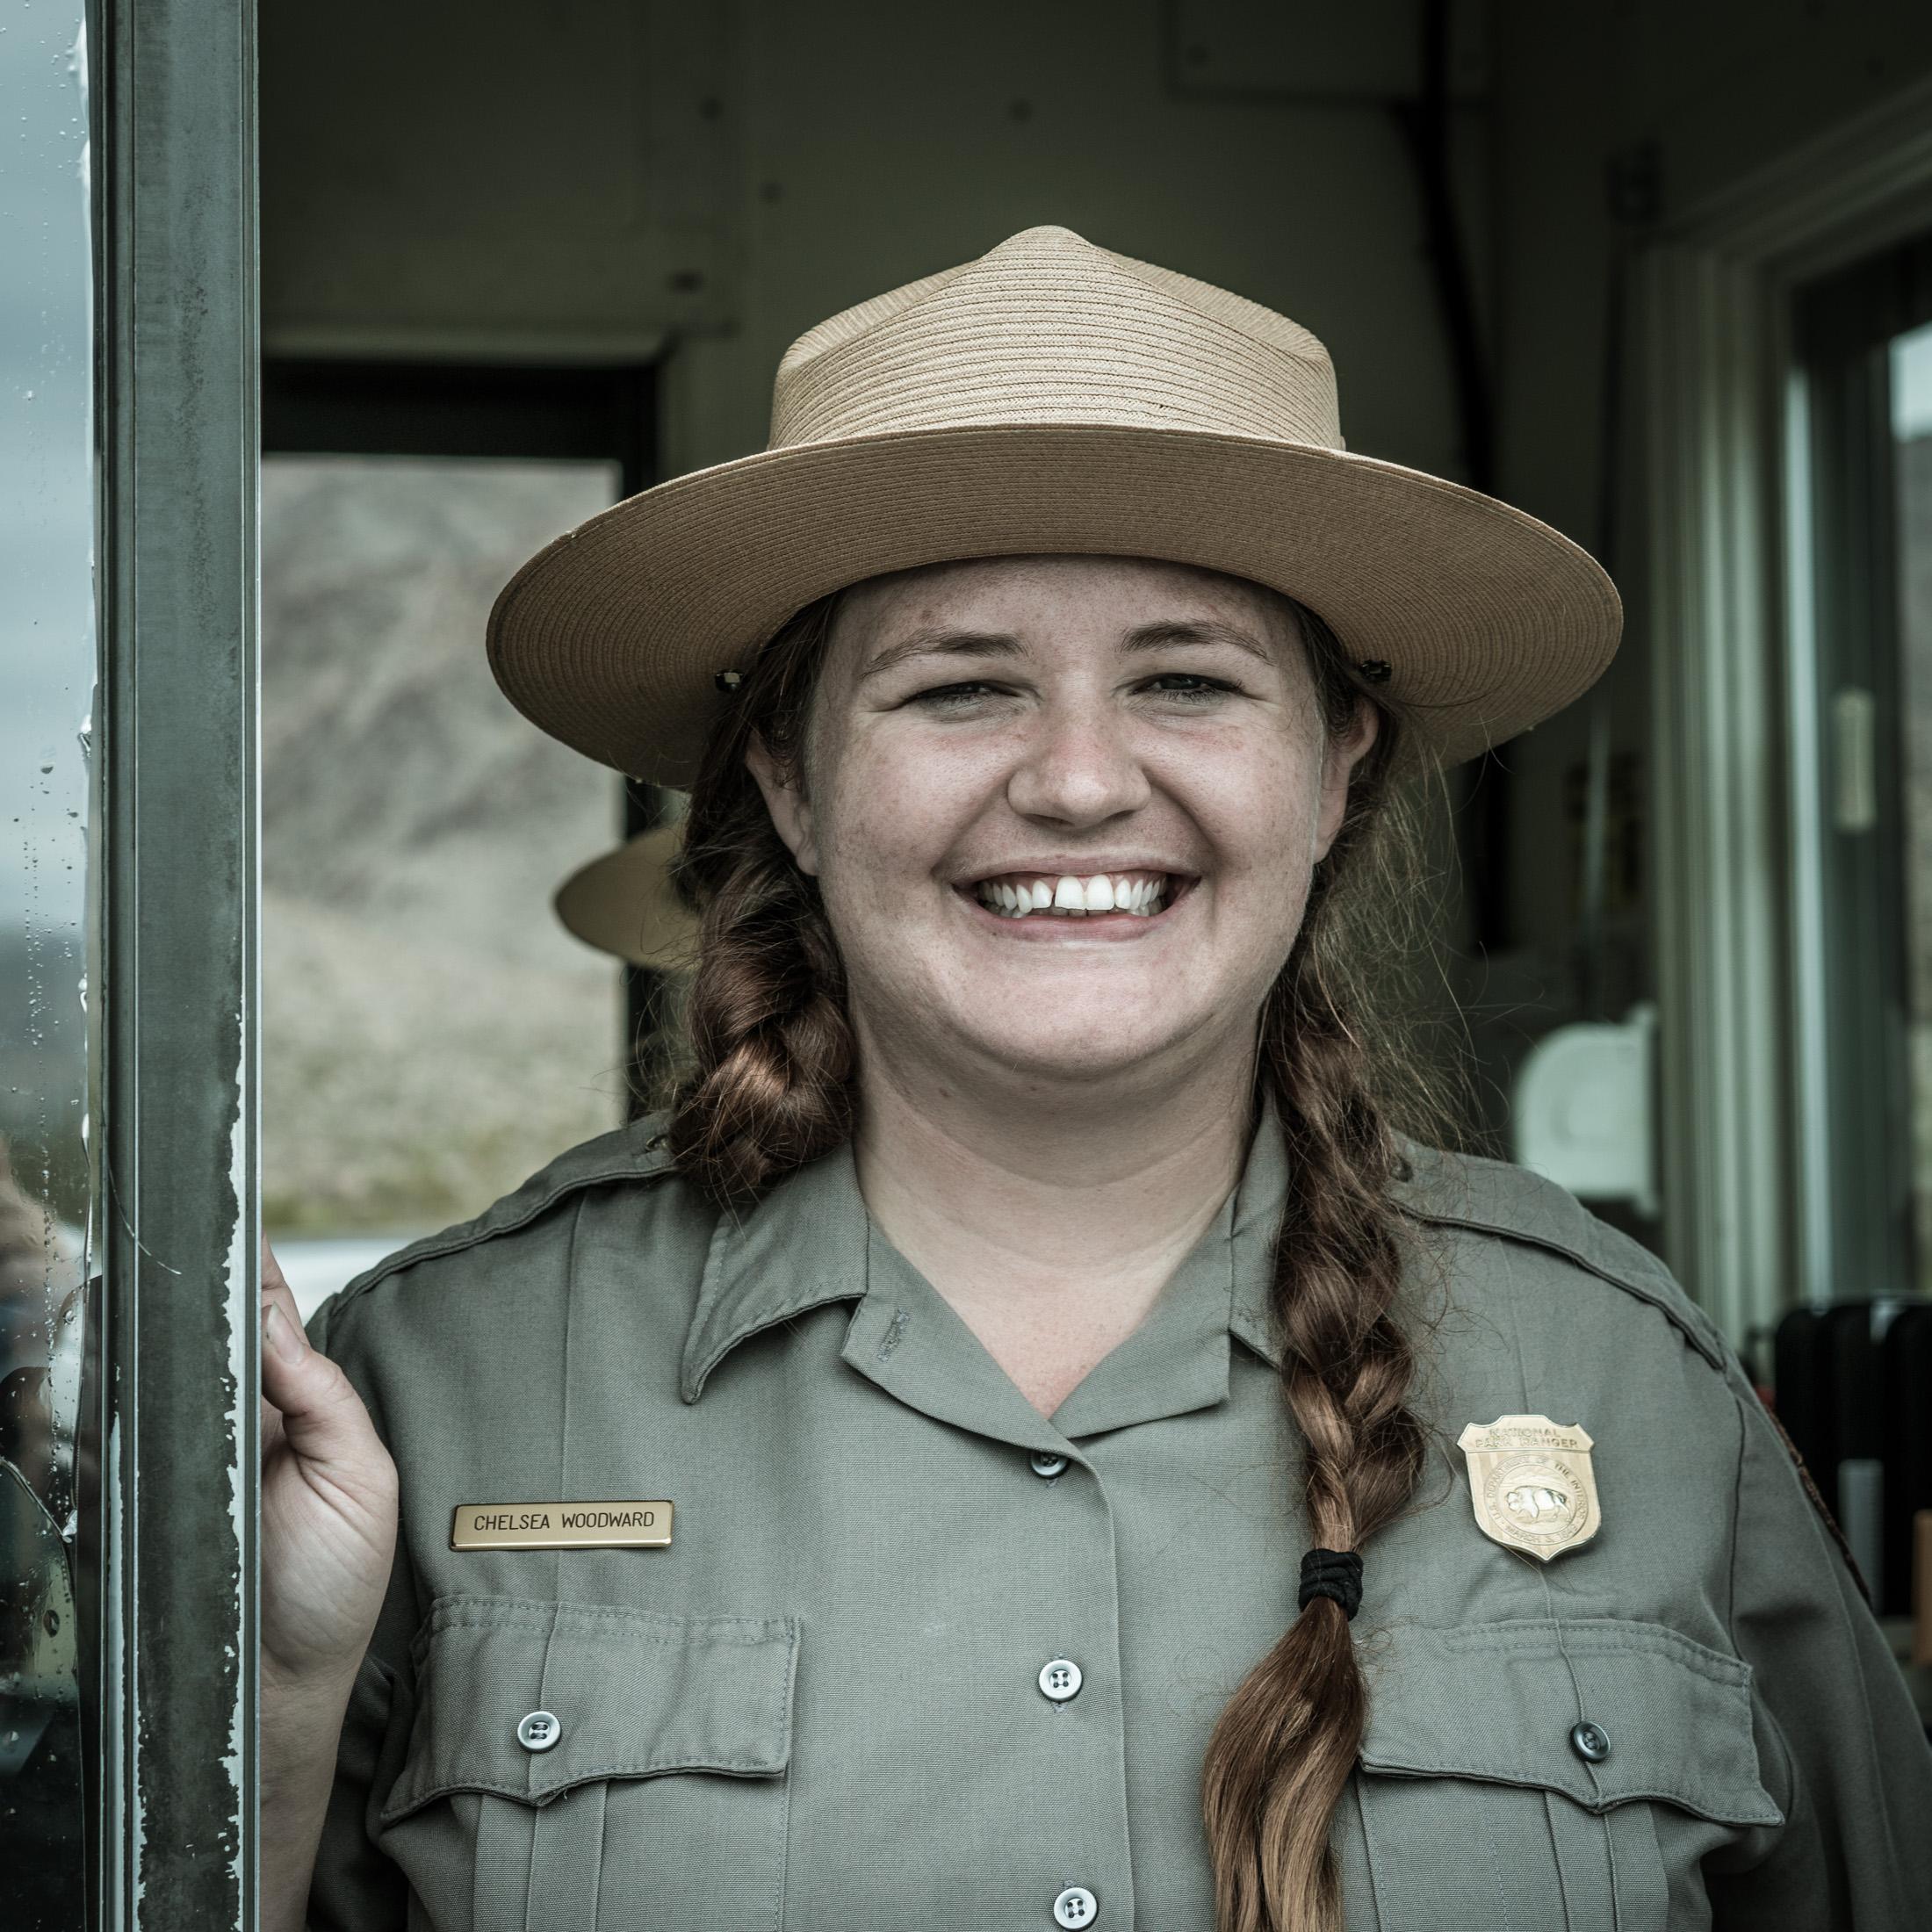 USA, Portraits, park ranger